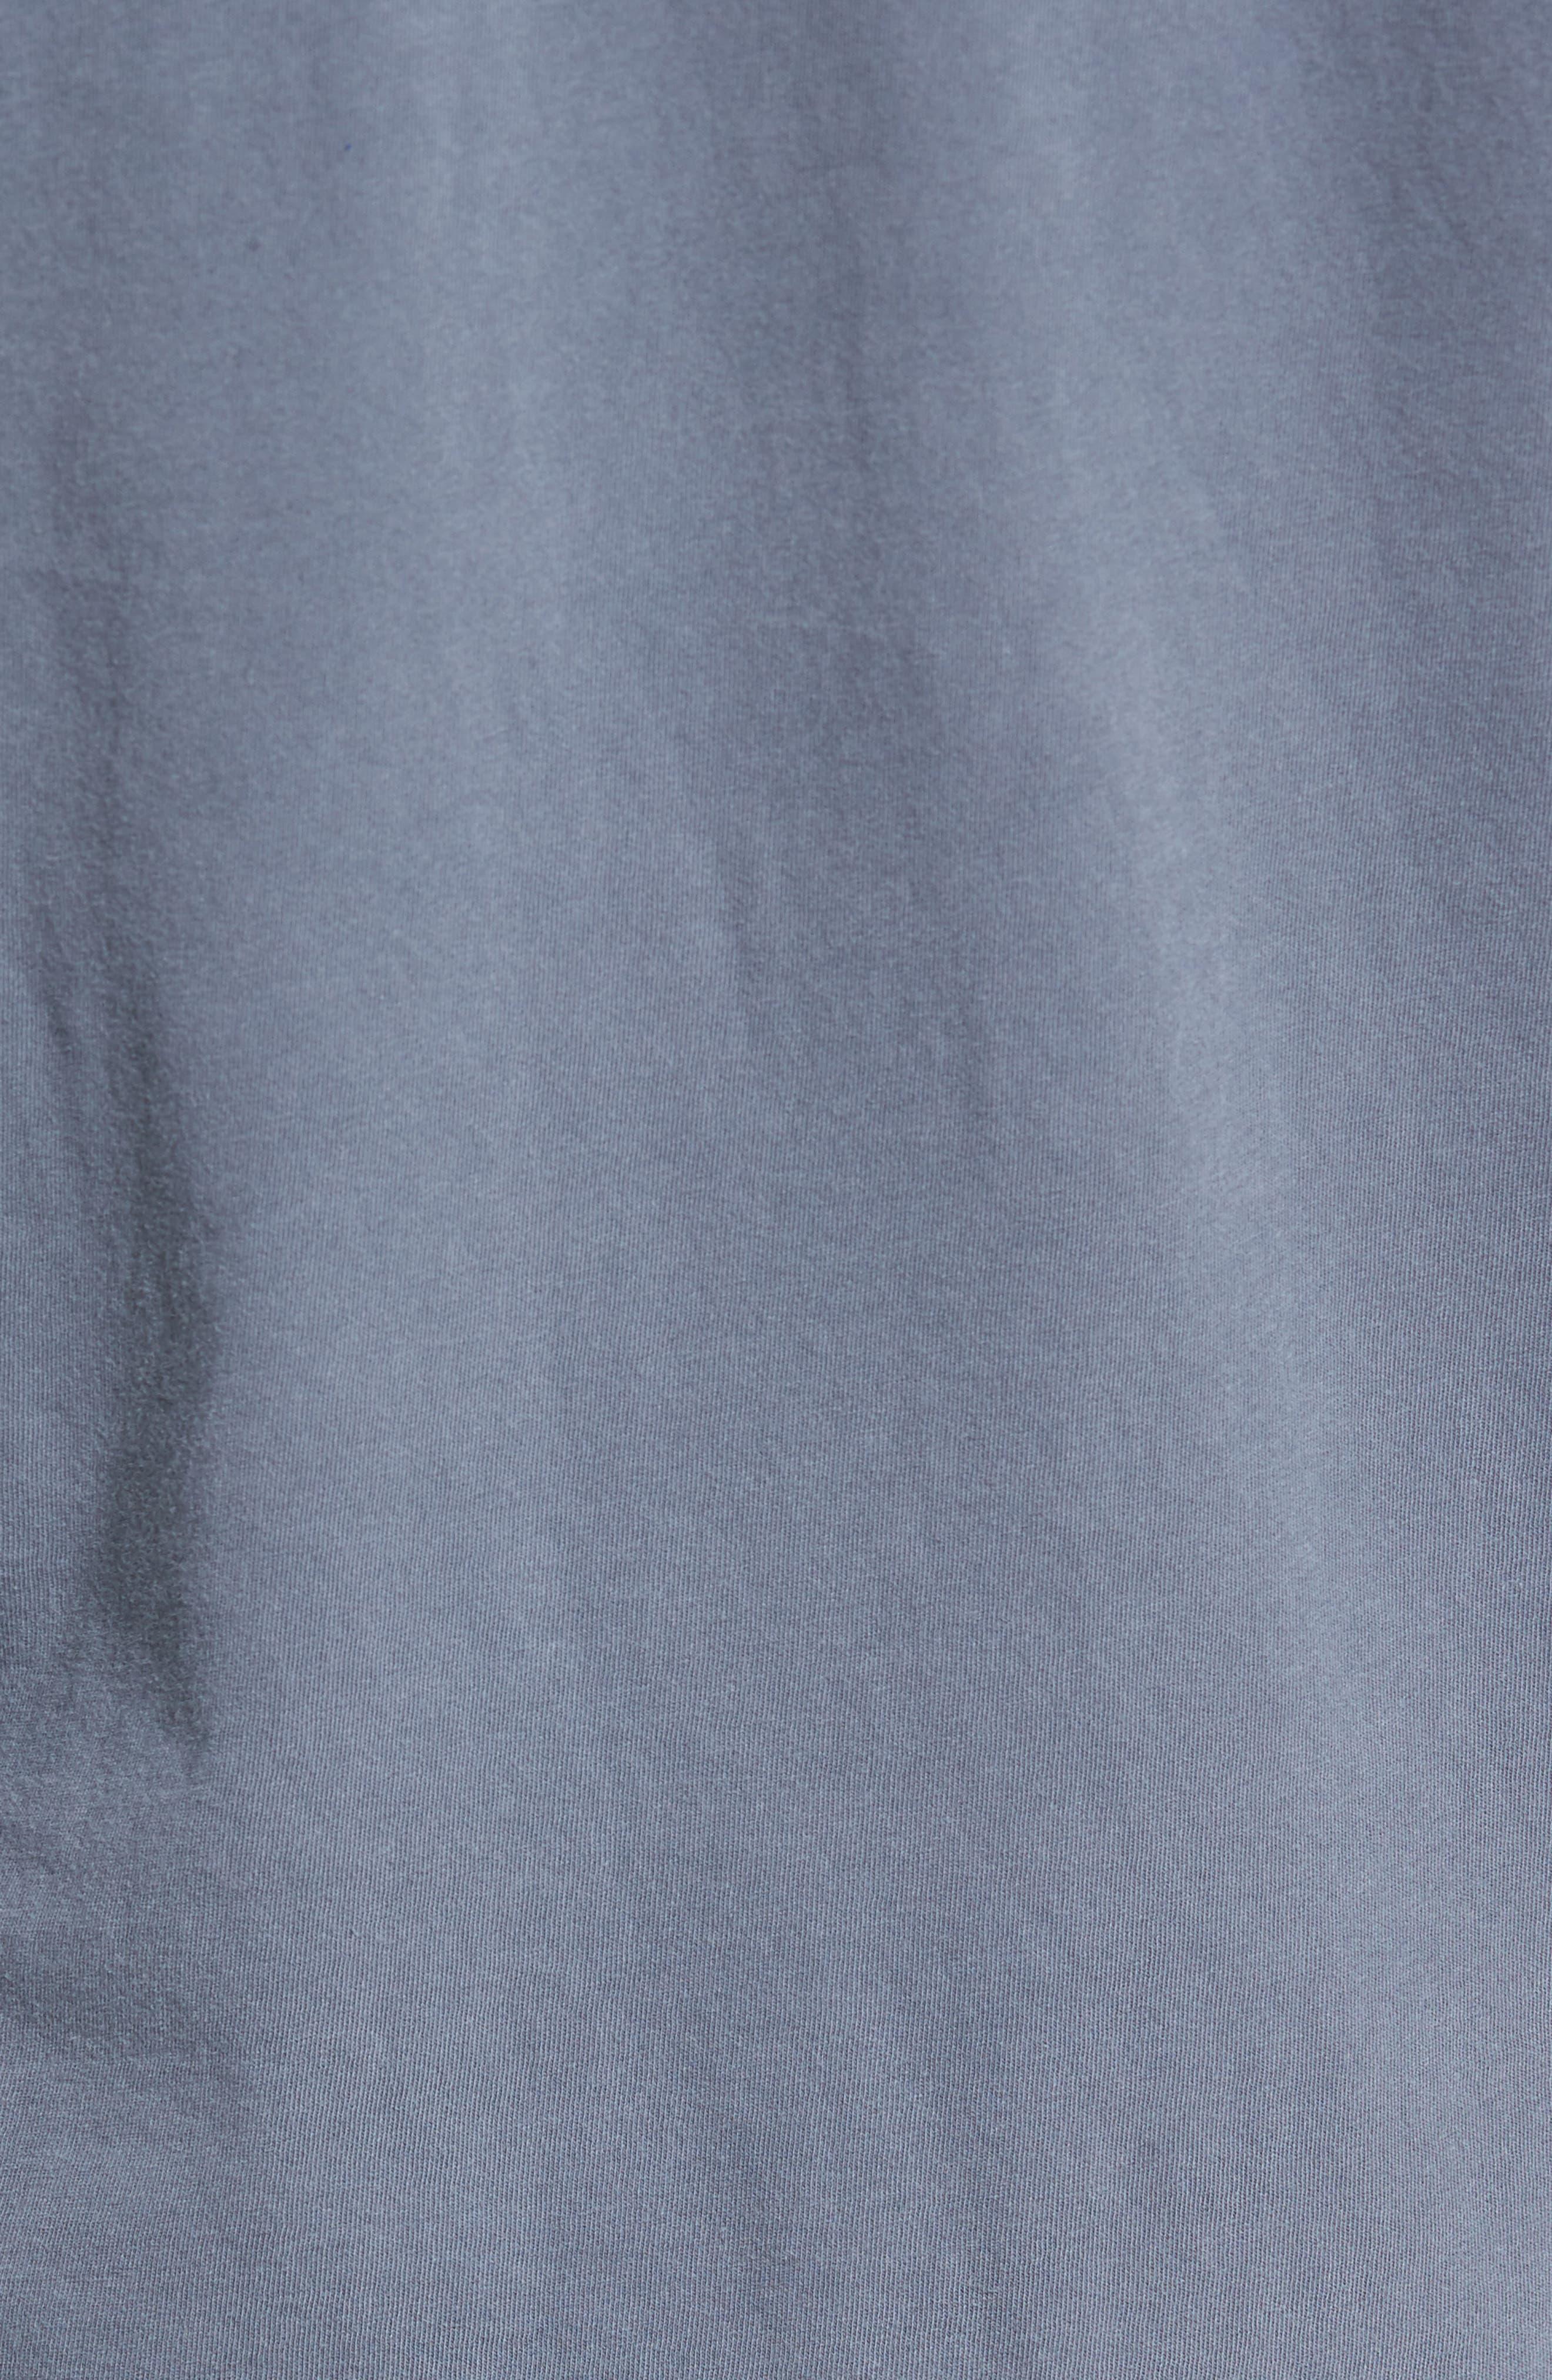 Long Sleeve Crewneck T-Shirt,                             Alternate thumbnail 5, color,                             NORTH PIGMENT GREY